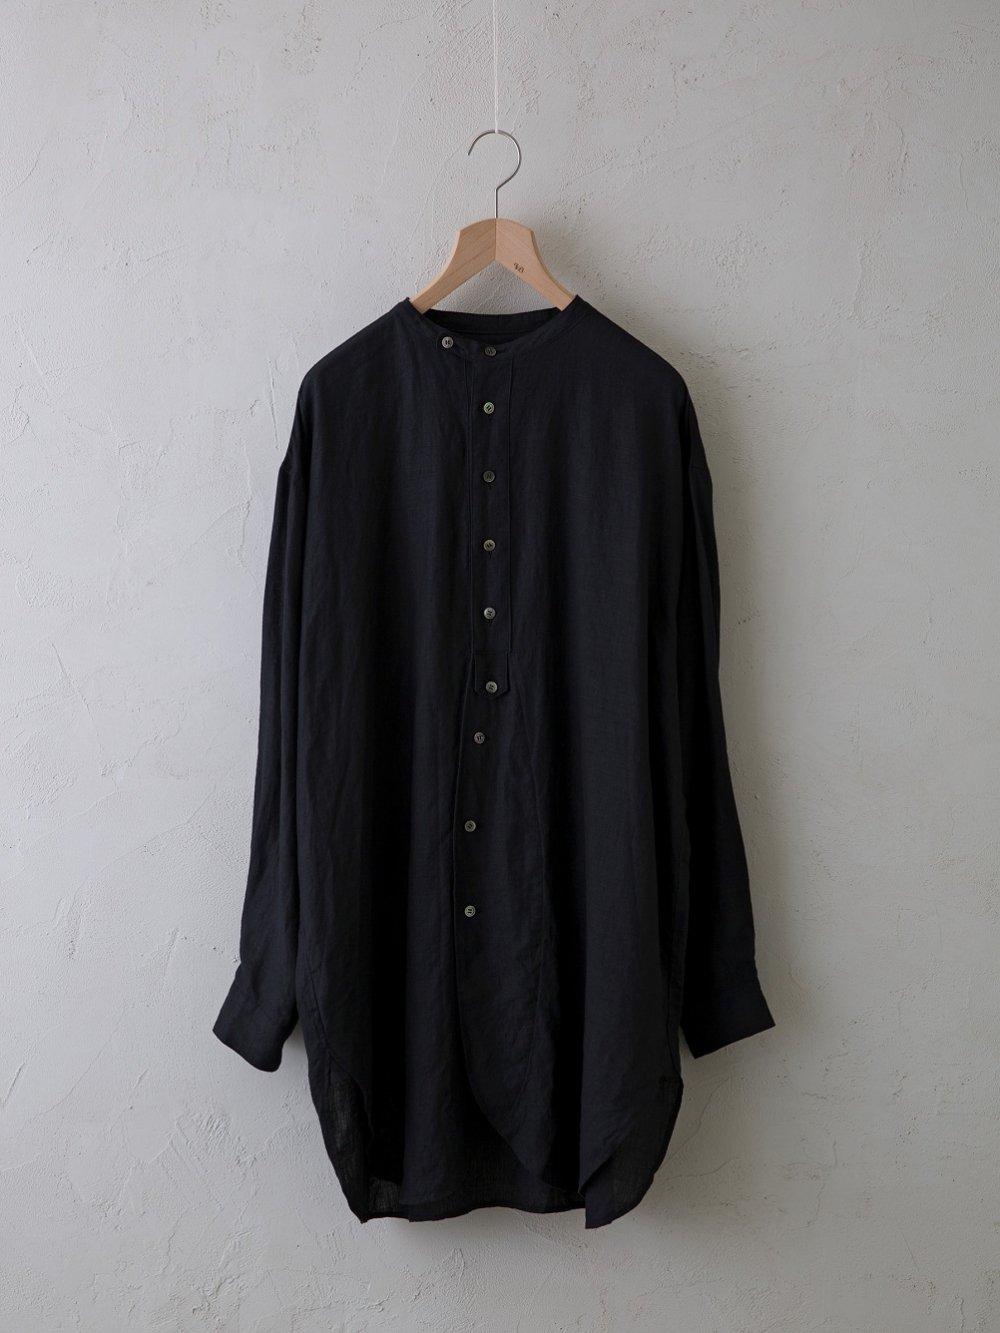 KL Heritage 60 チュニックシャツ (Unisex)